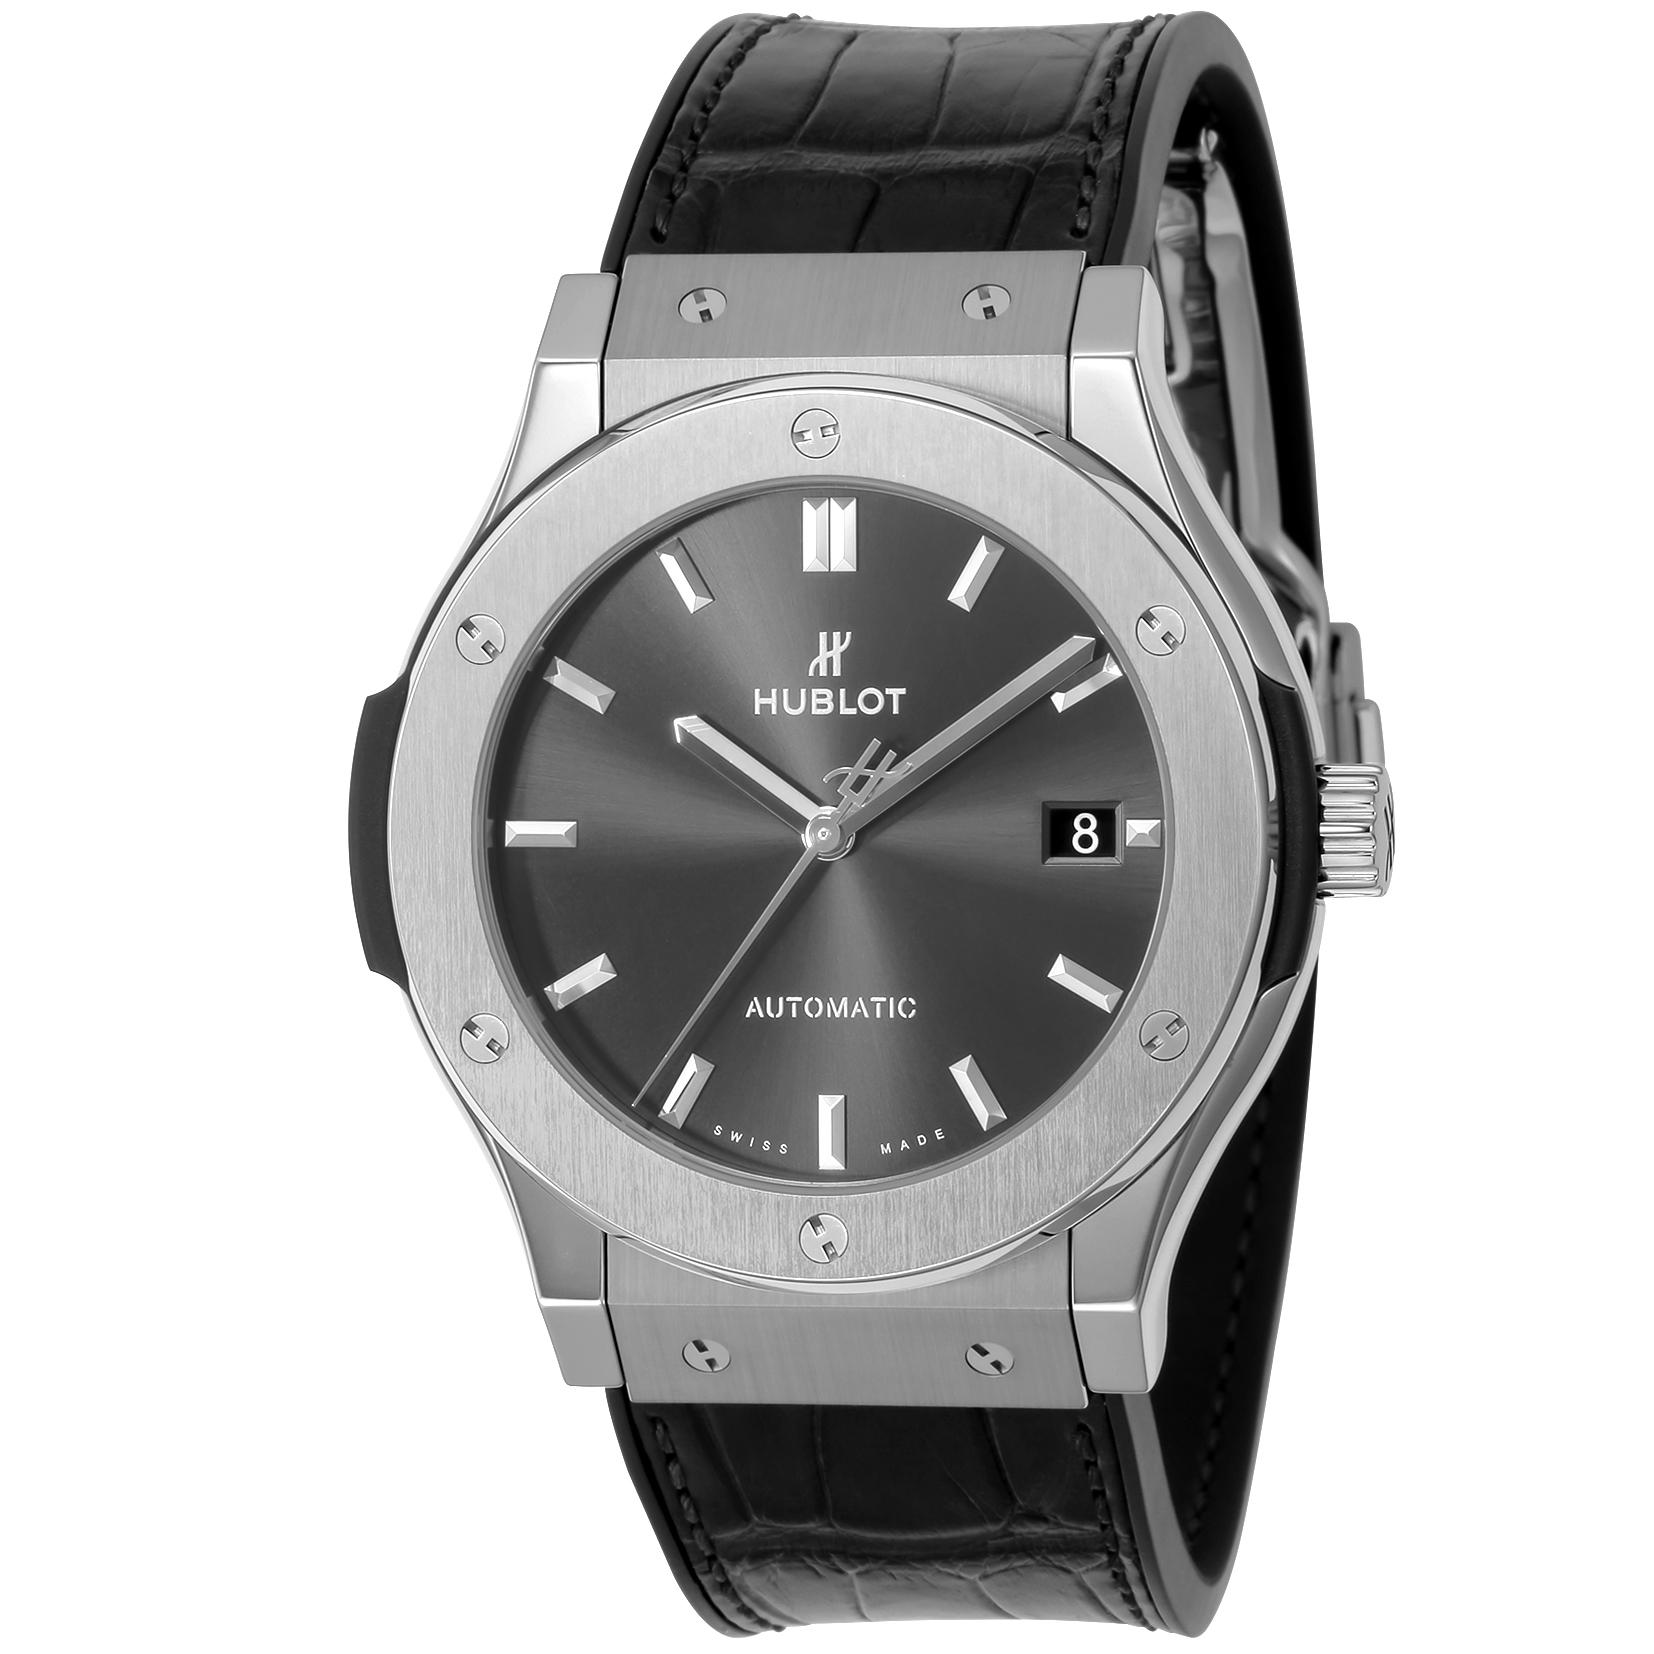 new product f20dd c2b38 ウブロ HUBLOT 腕時計 メンズ 511NX7071LR クラシック ...